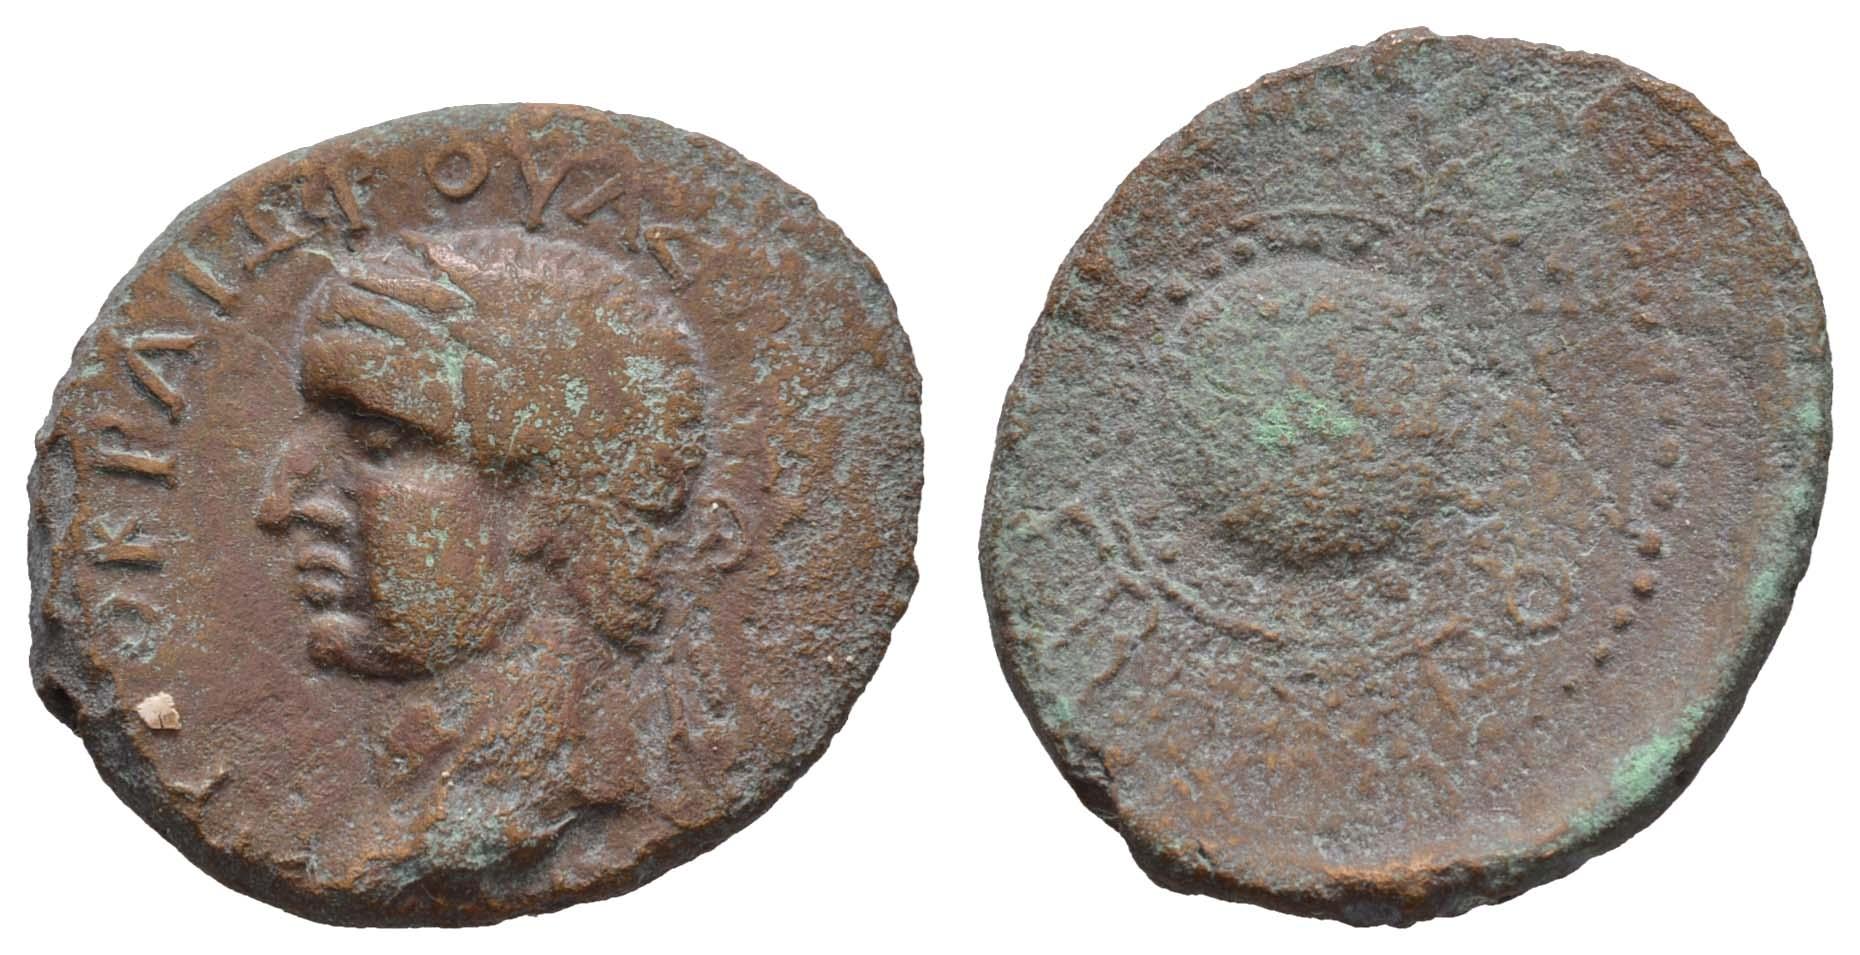 Lot 31 - Antike Griechen - Macedonia -  Auktionshaus Ulrich Felzmann GmbH & Co. KG Coins single lots